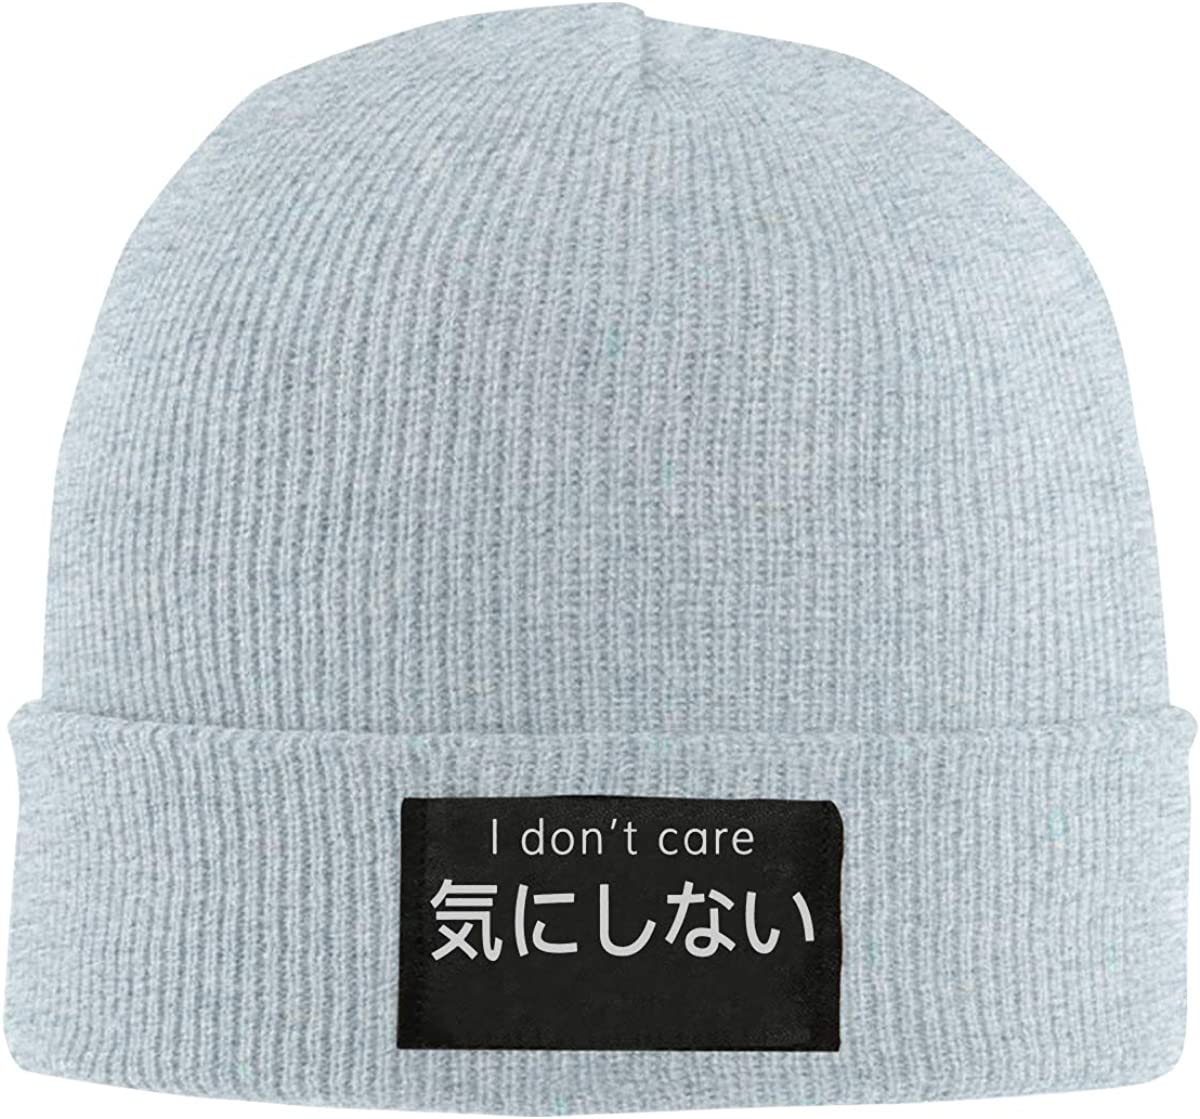 Men Women I Dont Care Skull Hat Beanie Cap Winter Knit Hat Cap